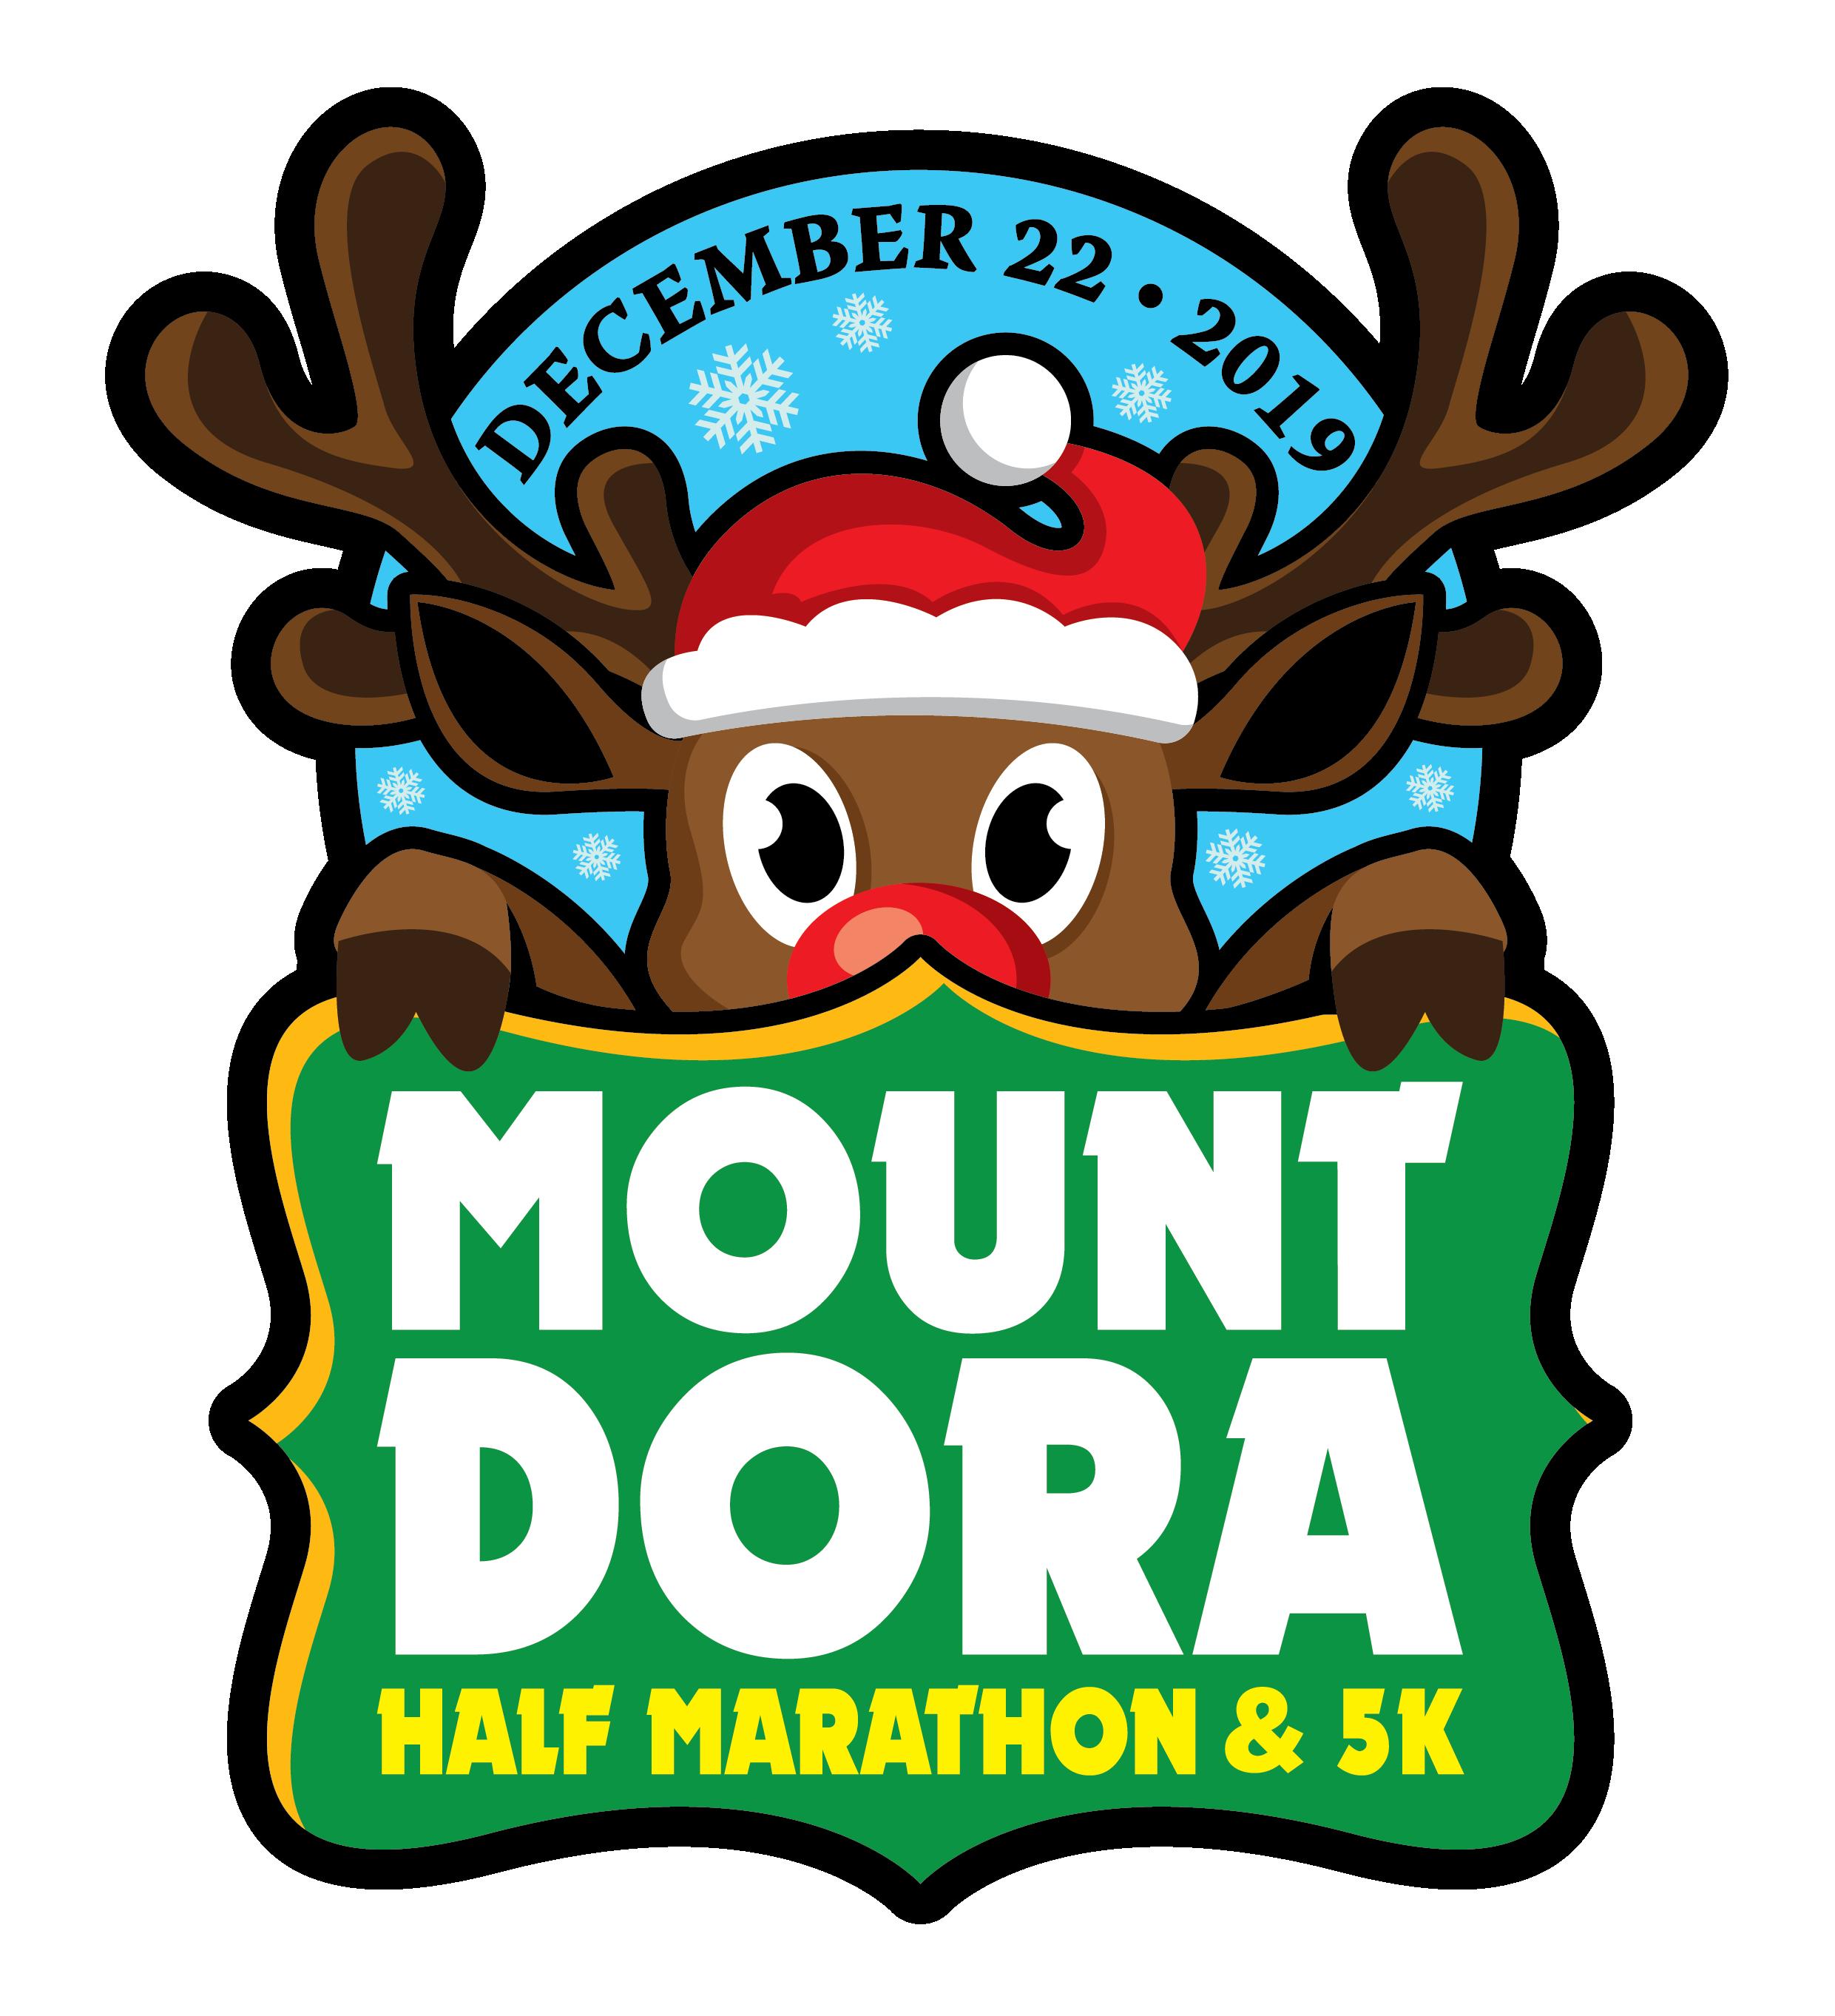 Mt Dora Christmas 2020 Mount Dora Half Marathon & 5K   December 22nd 2019